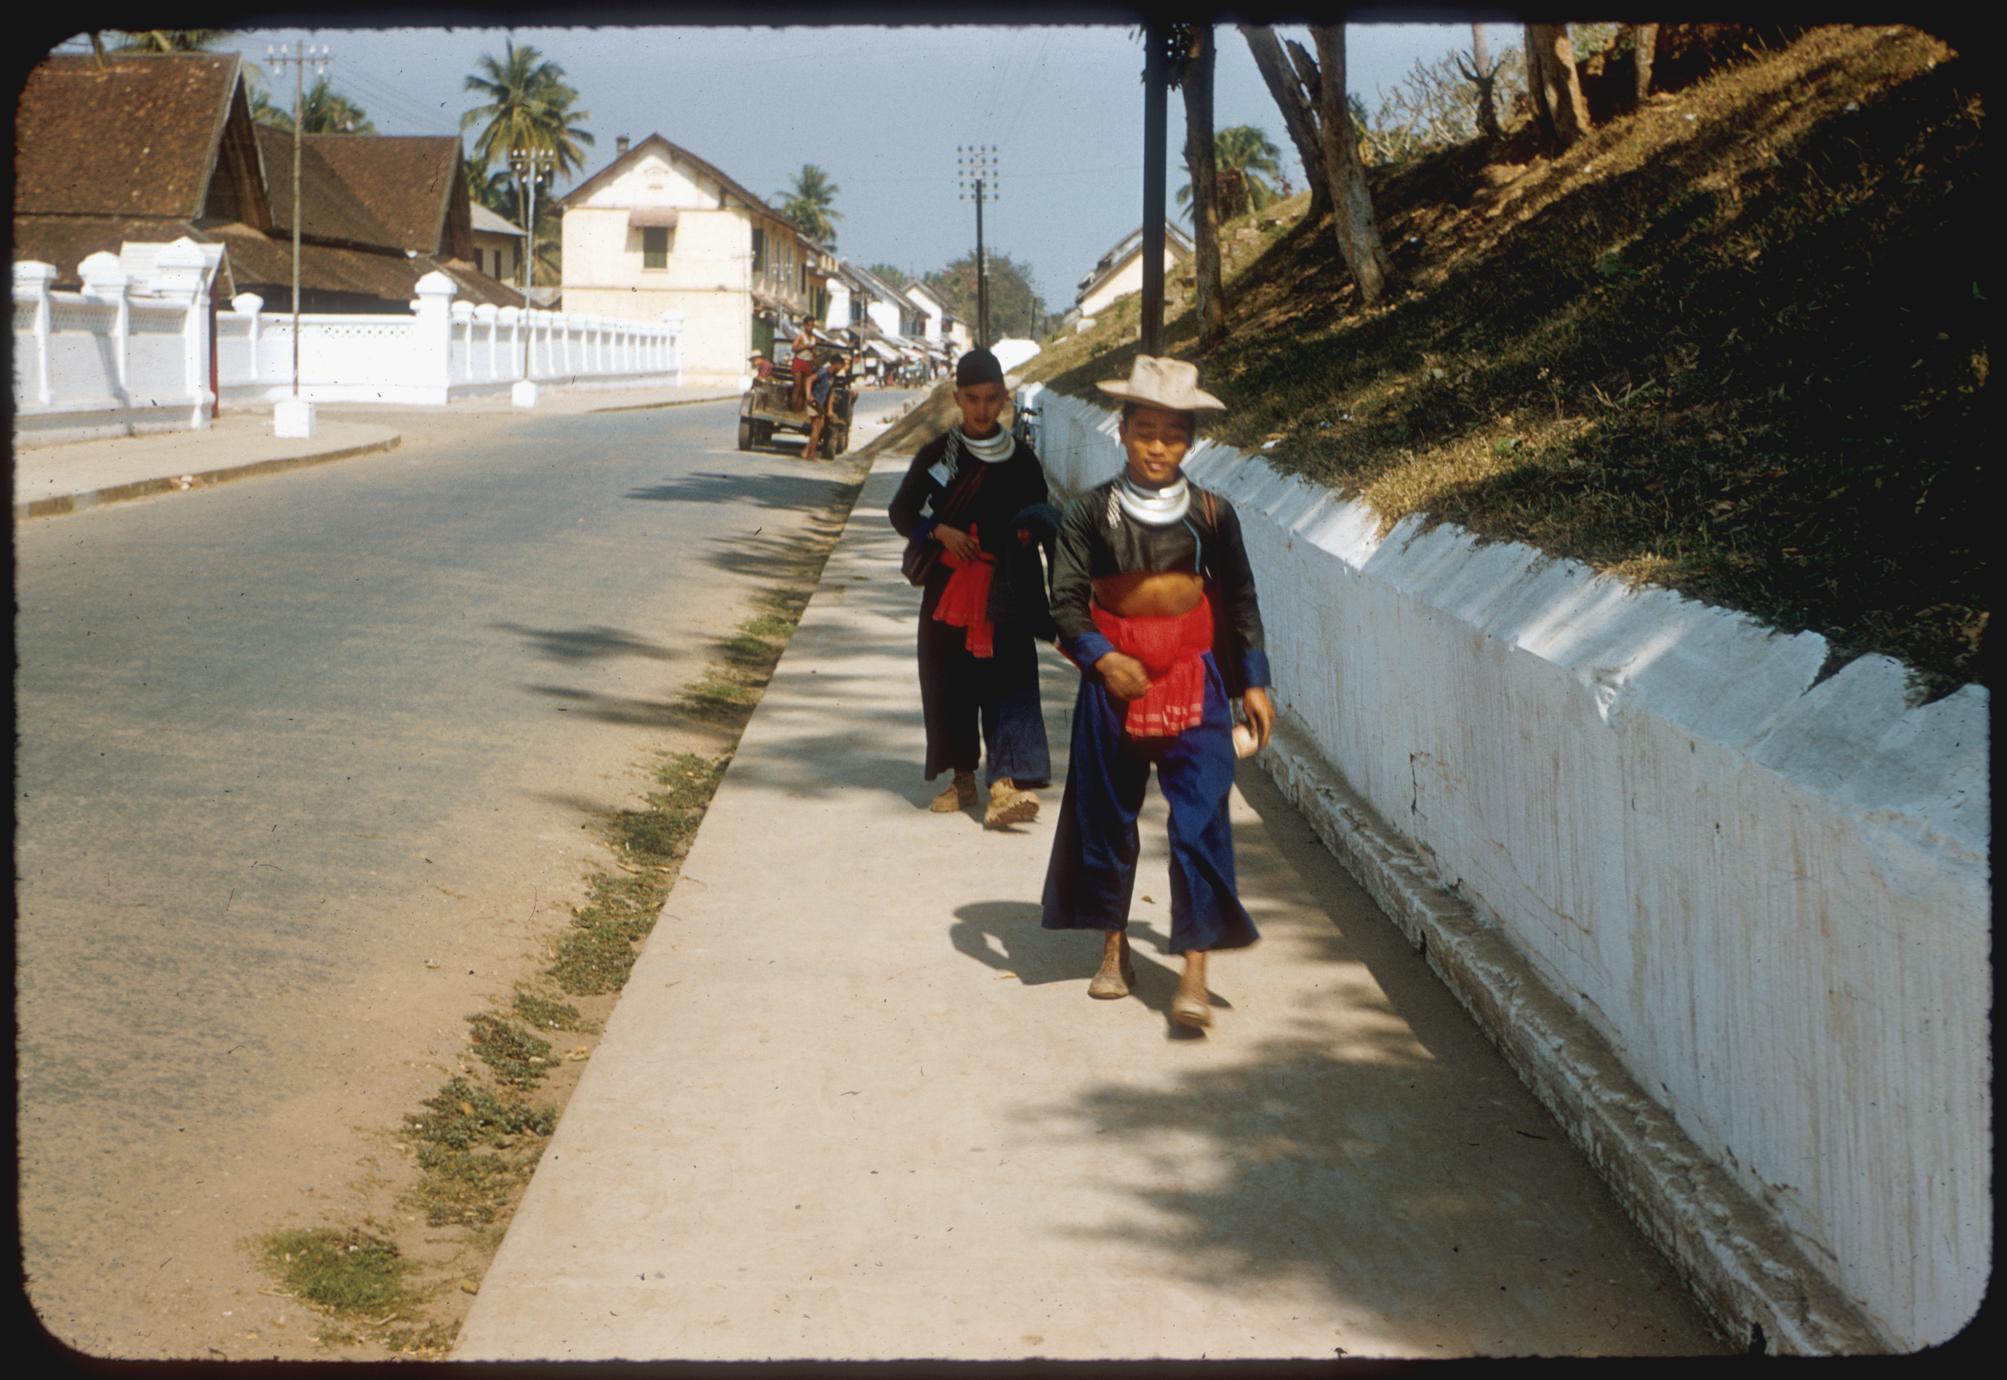 Two Hmong (Meo) men on main street.